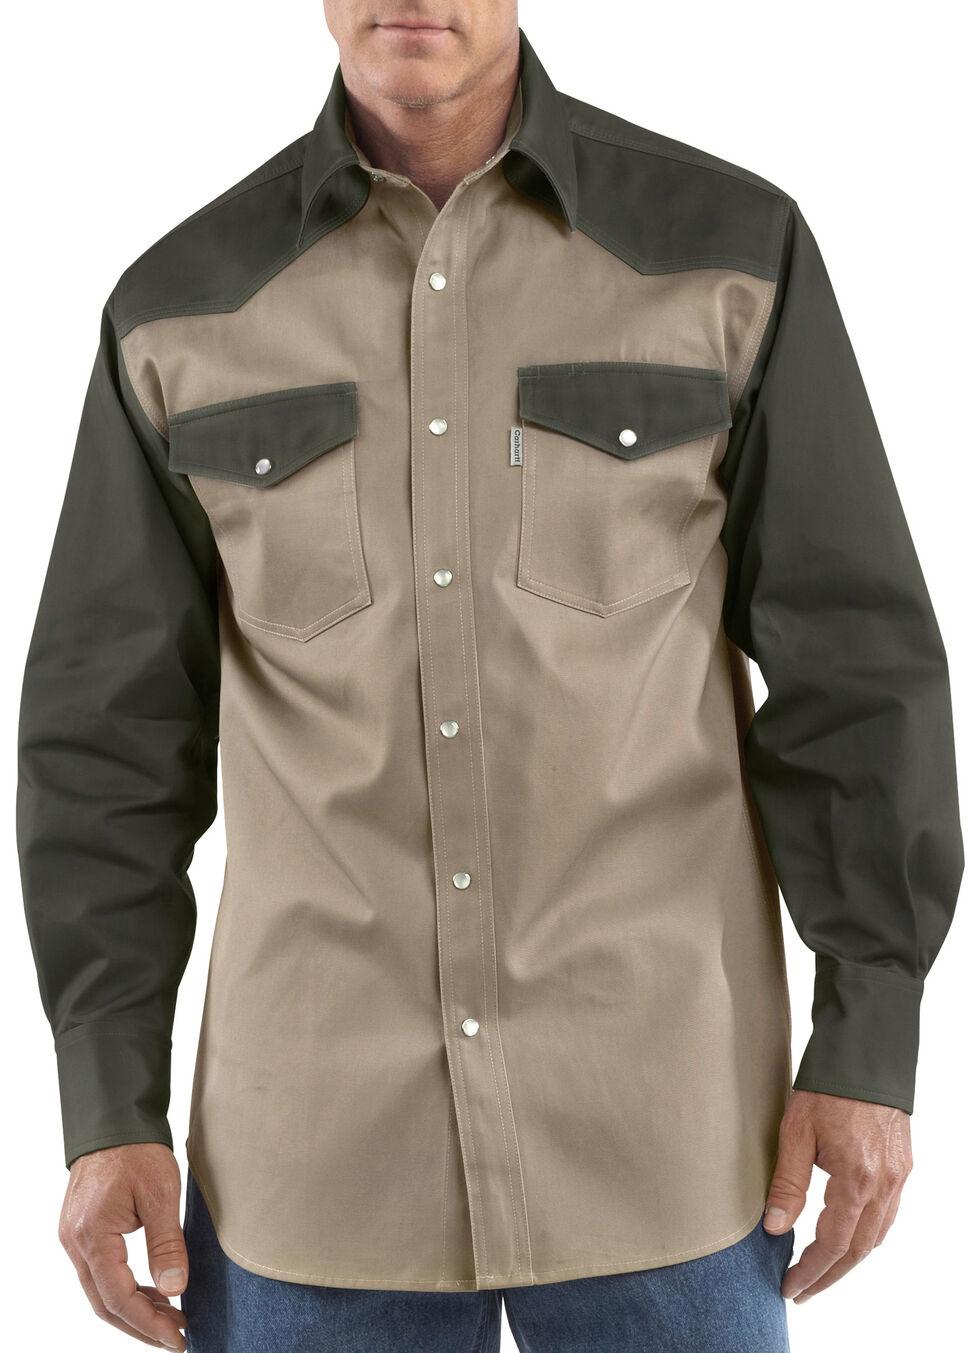 Carhartt Ironwood Twill Work Shirt - Big & Tall, Khaki, hi-res